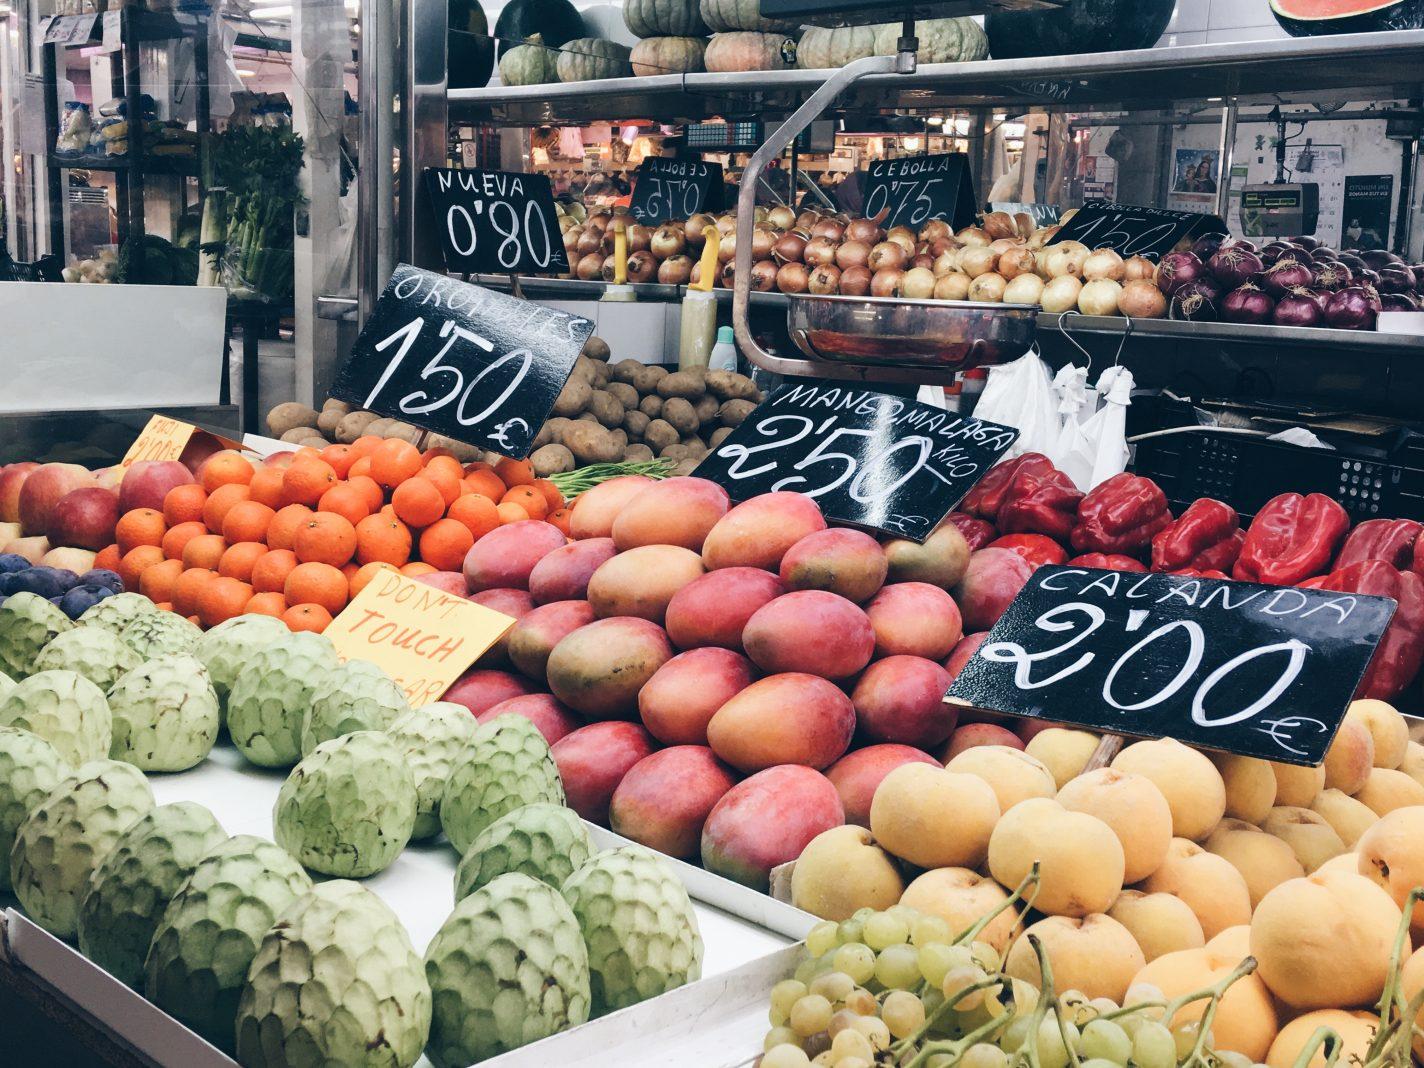 Markt in Valencia - things to do in Valencia